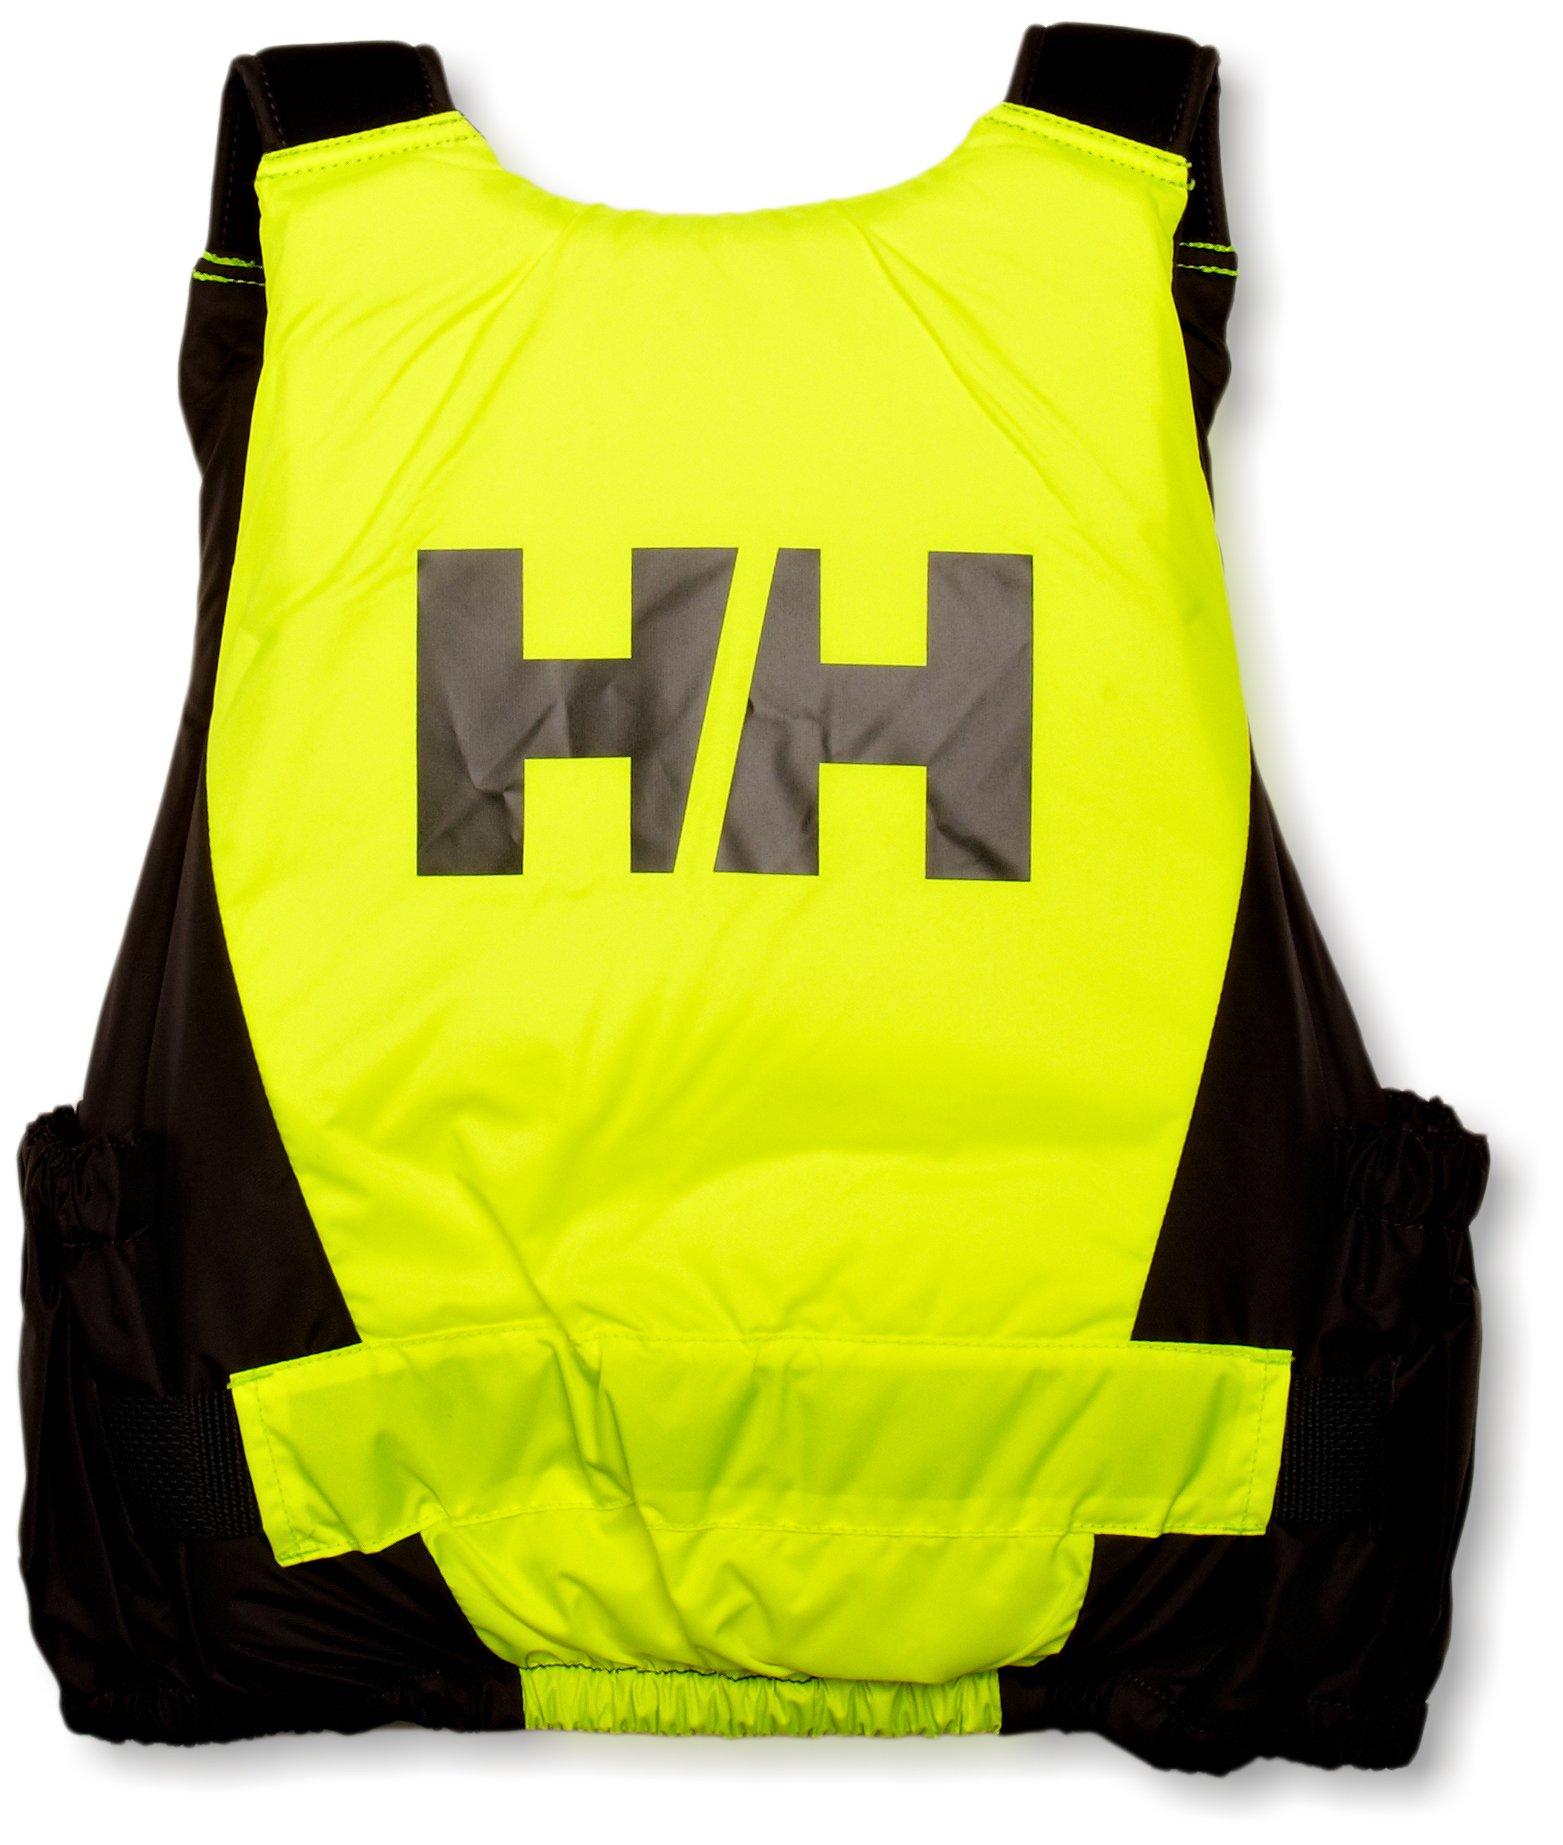 Helly Hansen 50N Rider Vest Top Kayak Dinghy Sailing PFD Buoyancy Aid for Watersports Fluro Yellow - Unisex Low bulk